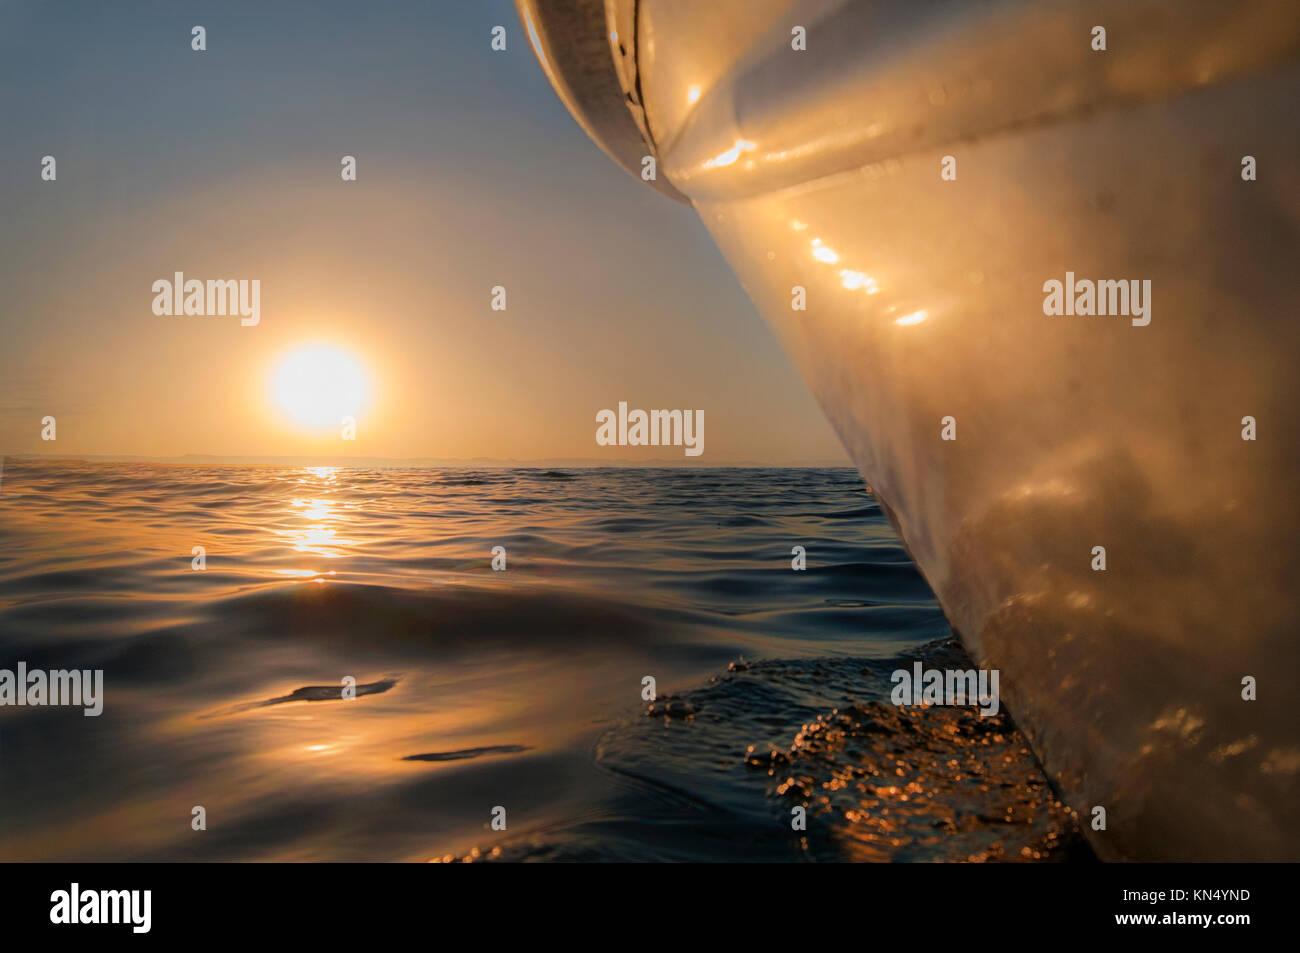 Boat sailing towars the sunset, by the sea of cortes near La Paz Baja California Sur Mexico Stock Photo